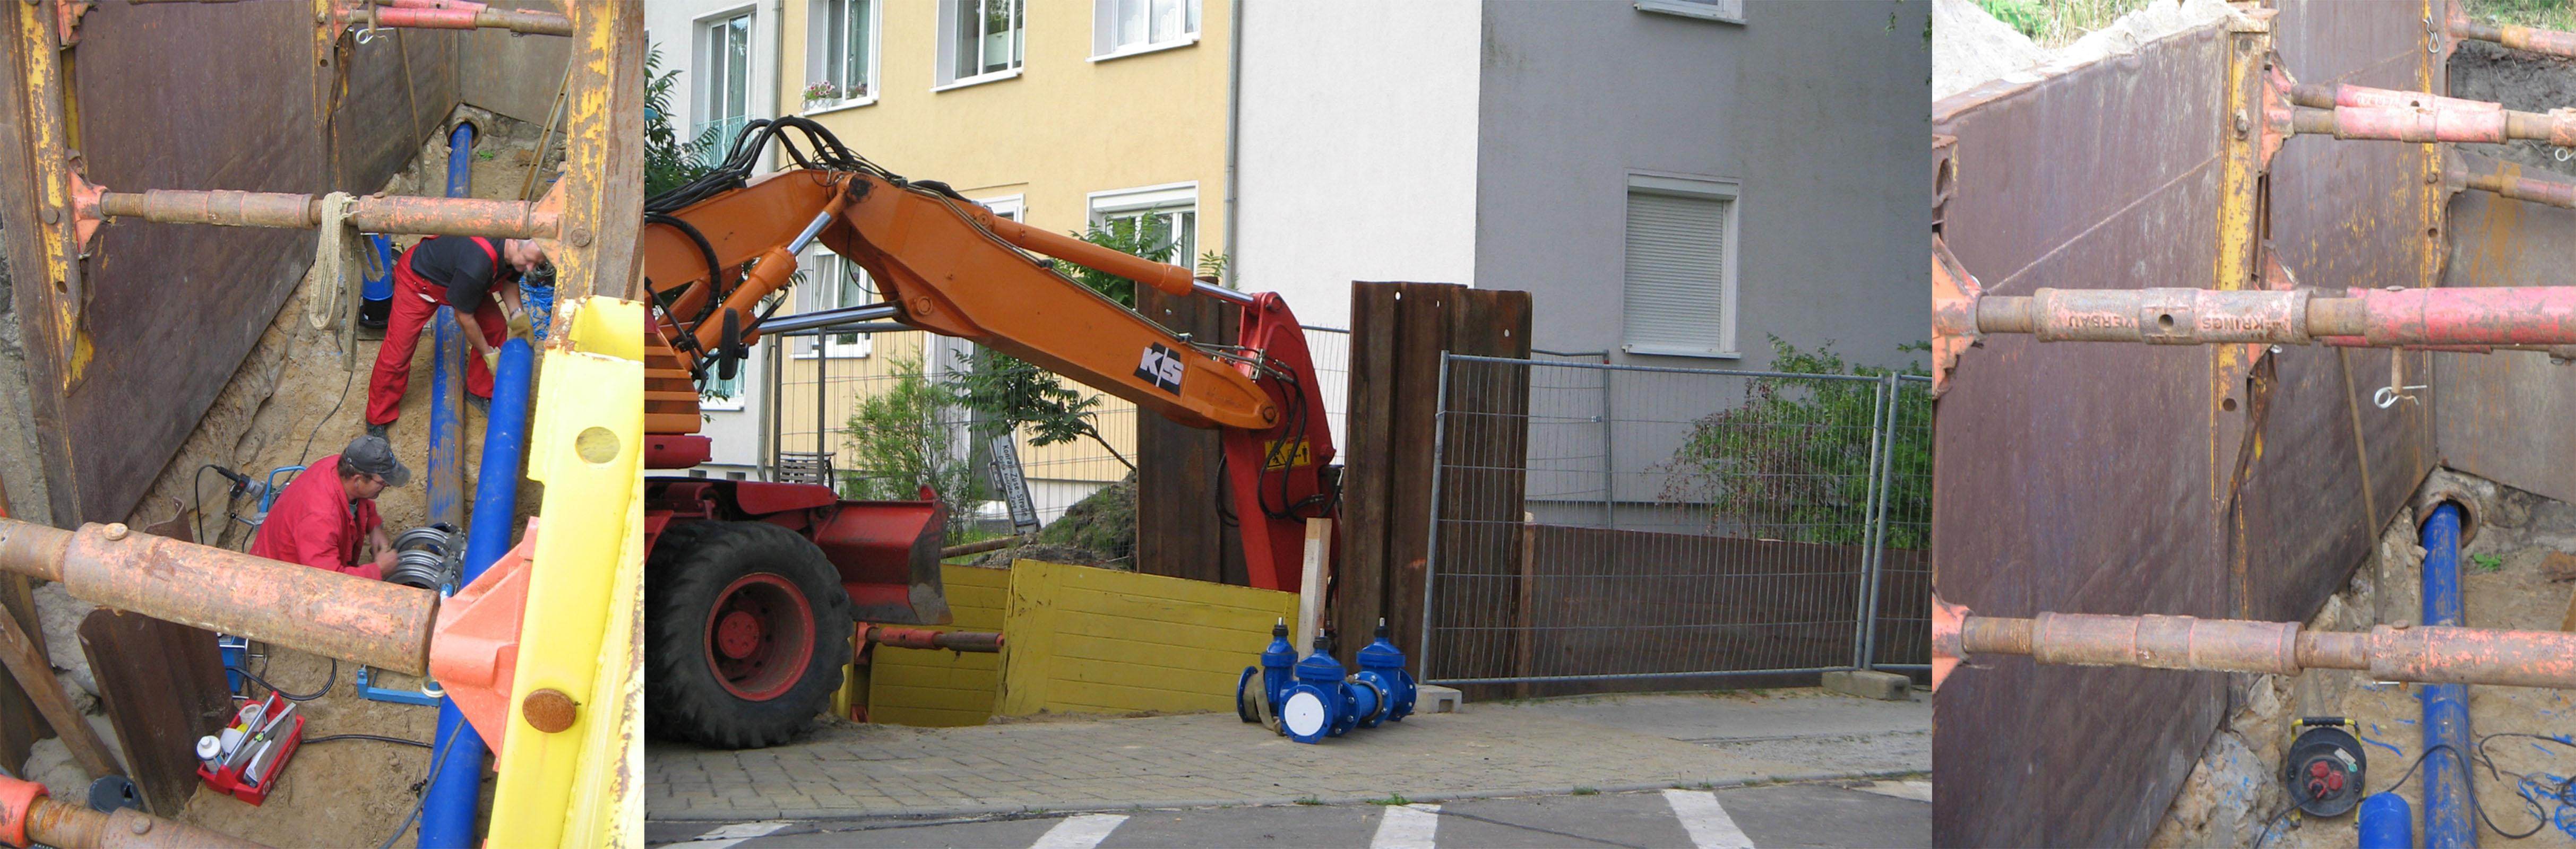 rueckbau-infra_herrmann-str-ecke-zuse-str_2008